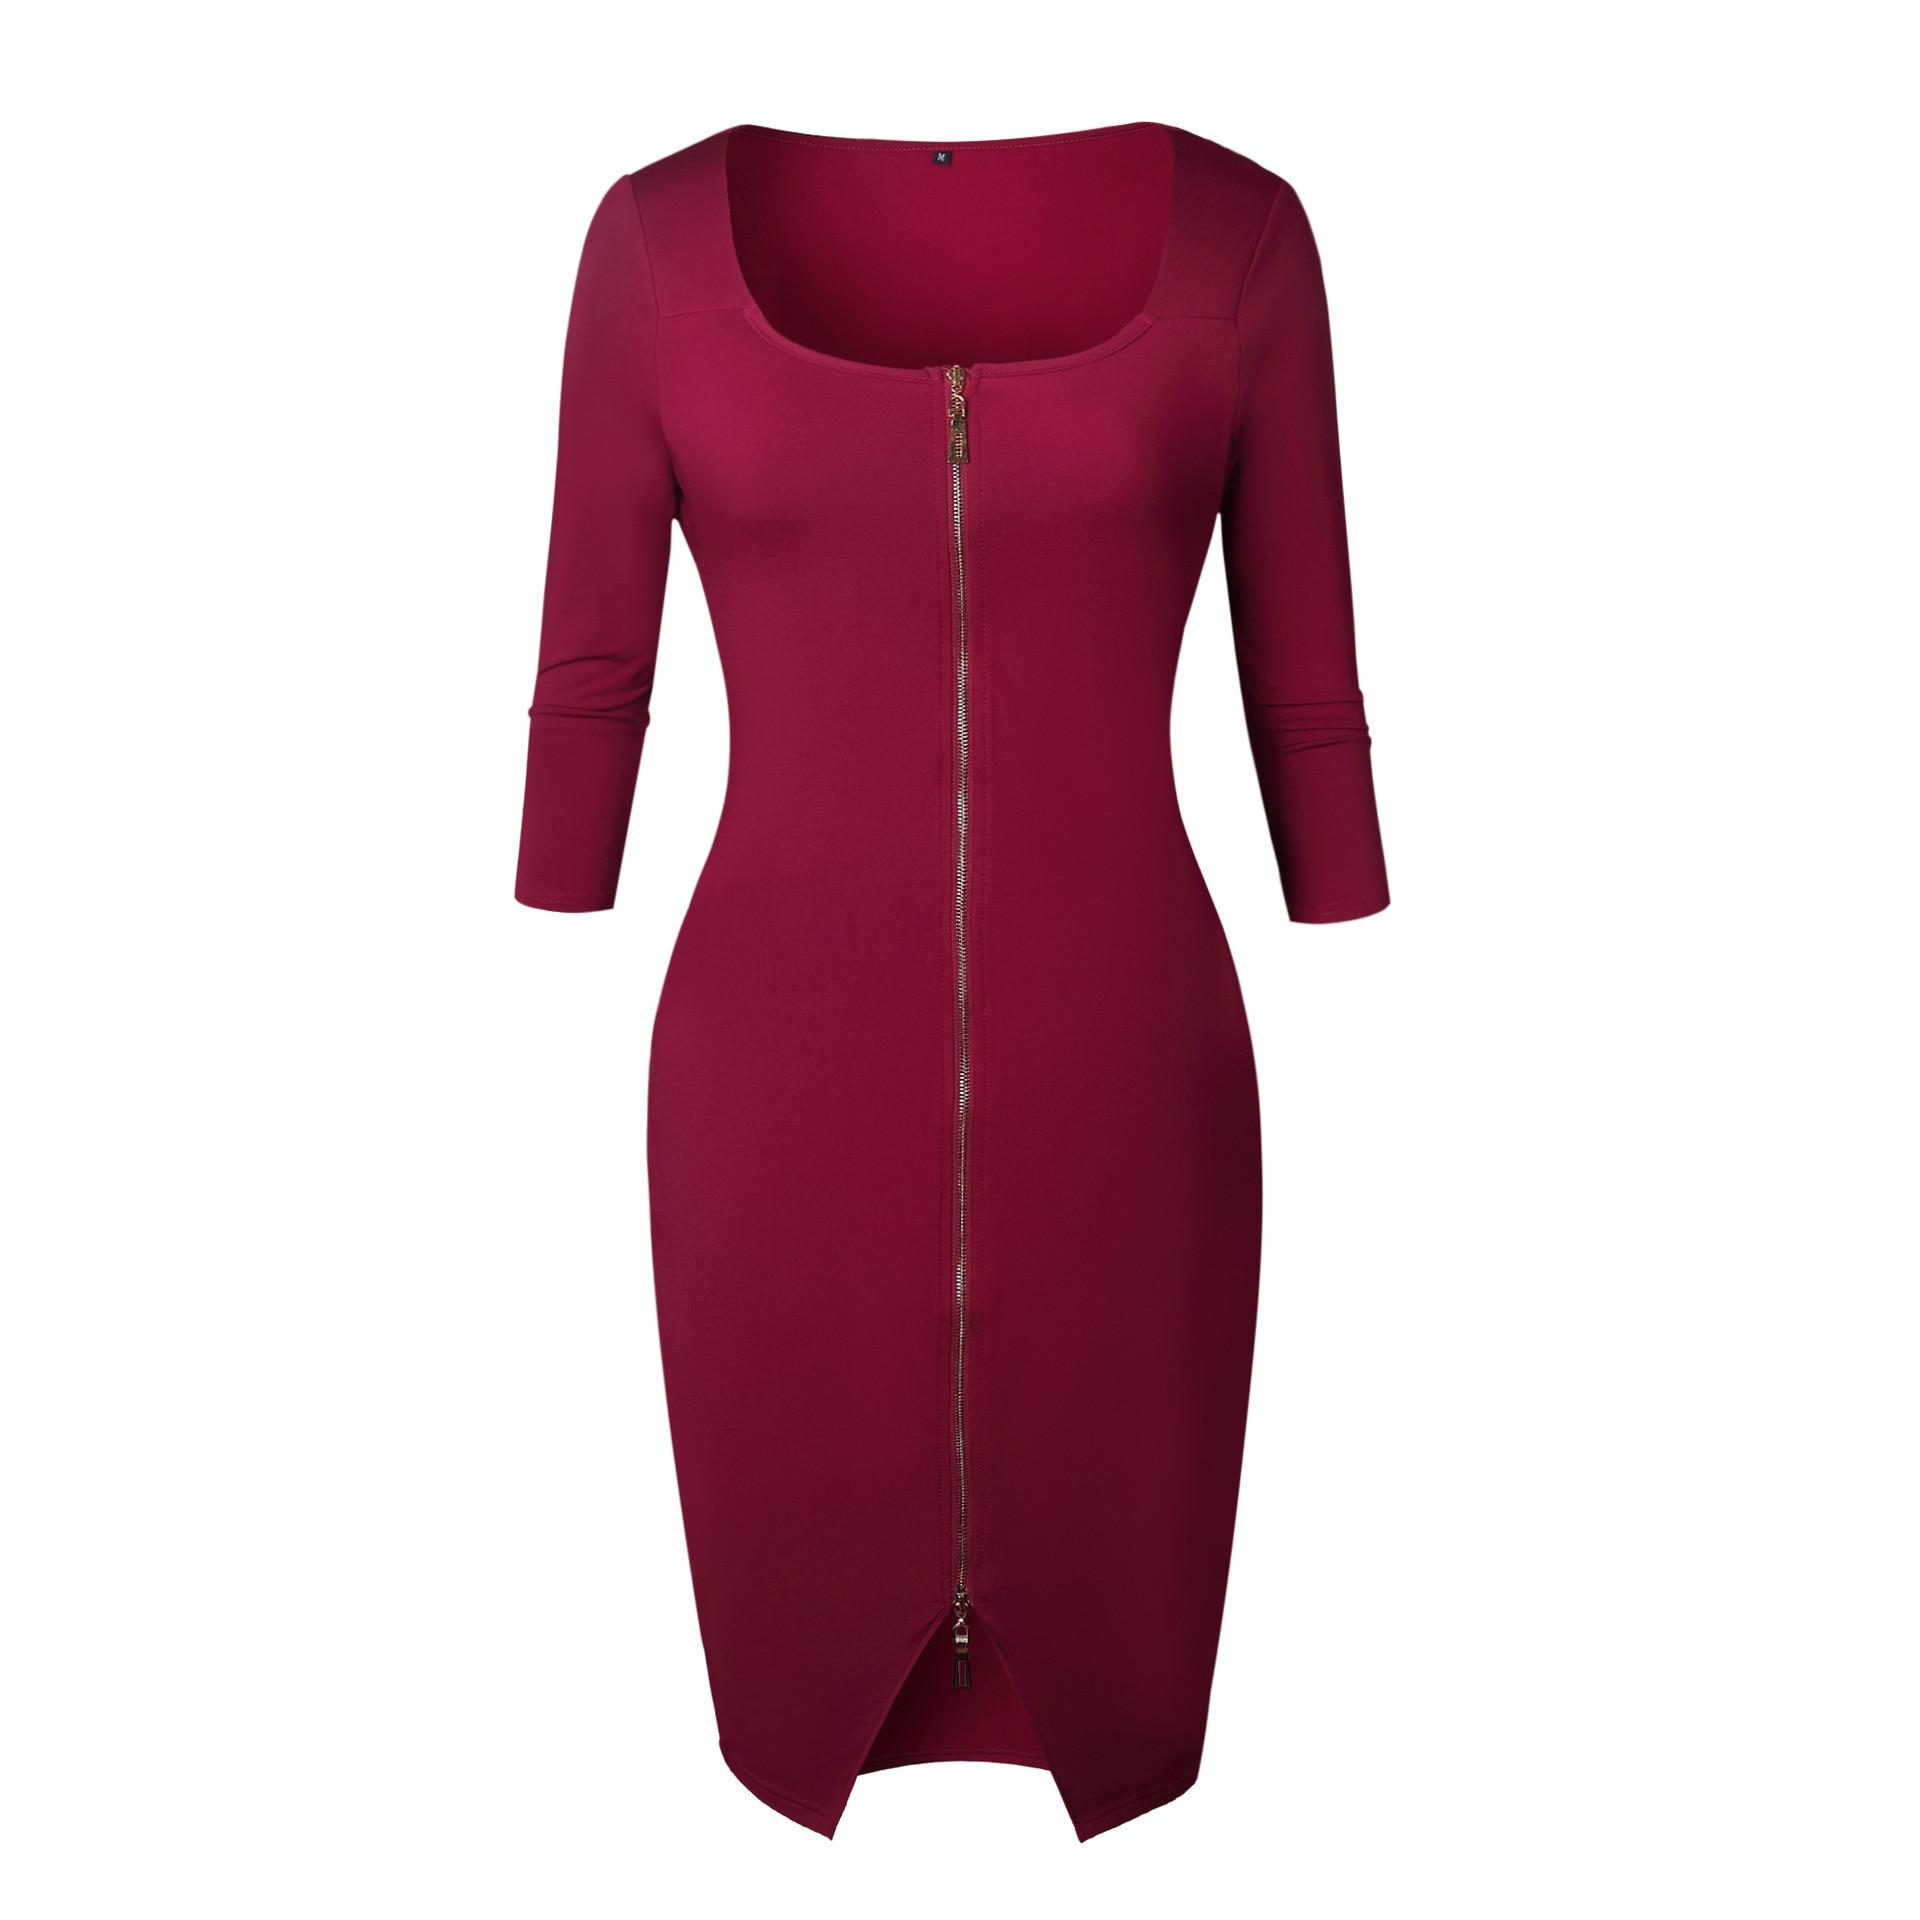 Women Sexy Club Low Cut Bodycon Dress Red Velvet Sheath 2018 Casual Autumn Winter Zipper Fashion